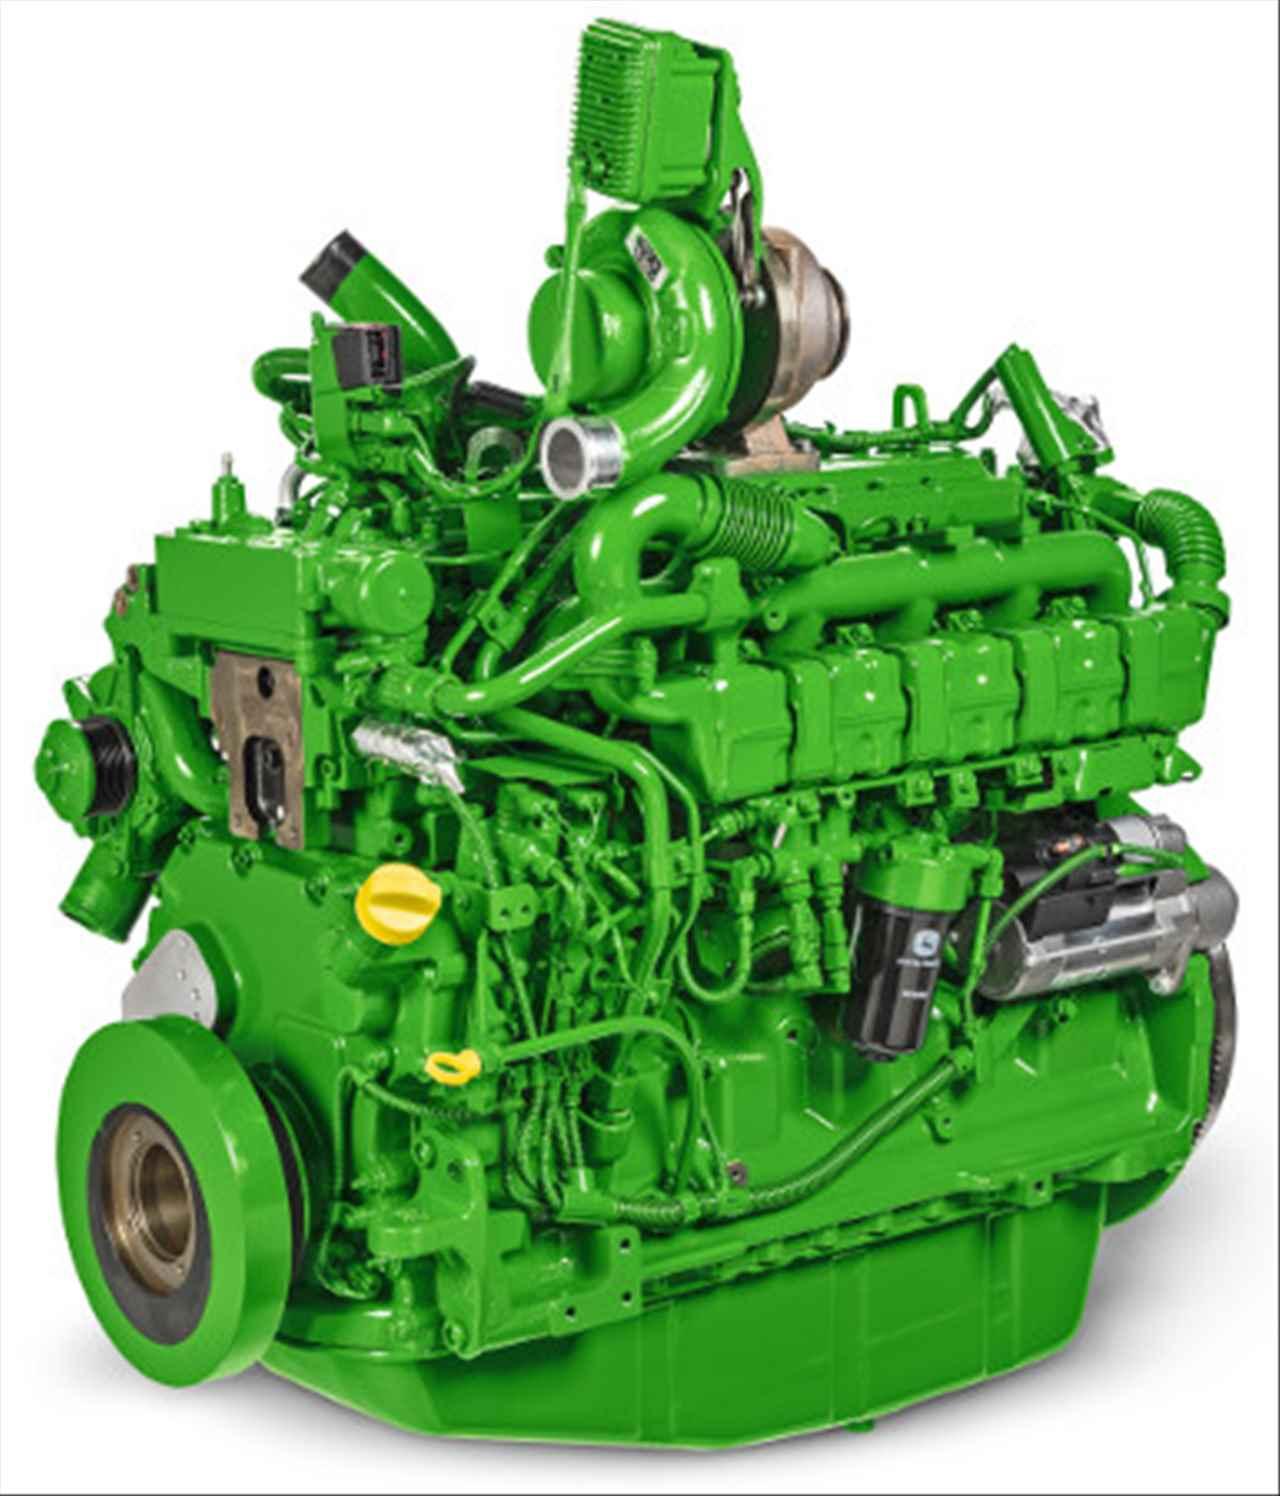 varzea-grande%2fmt%2fmotor-john-deere%2fpecas%2fbressan-agro%2f12453